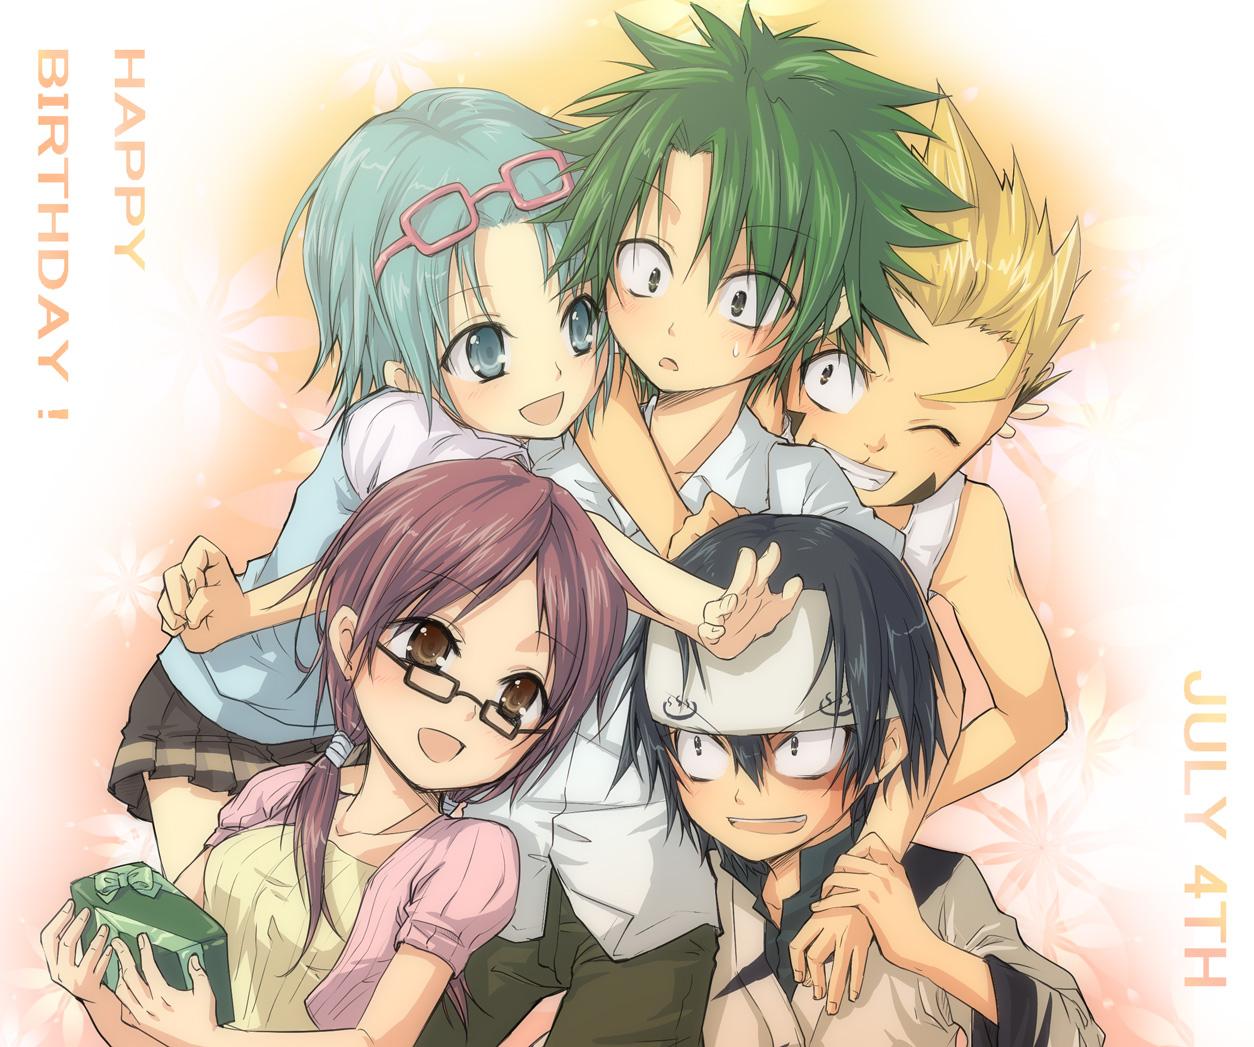 Law of ueki clipart jpg free library Ueki Kosuke - The Law of Ueki - Zerochan Anime Image Board jpg free library